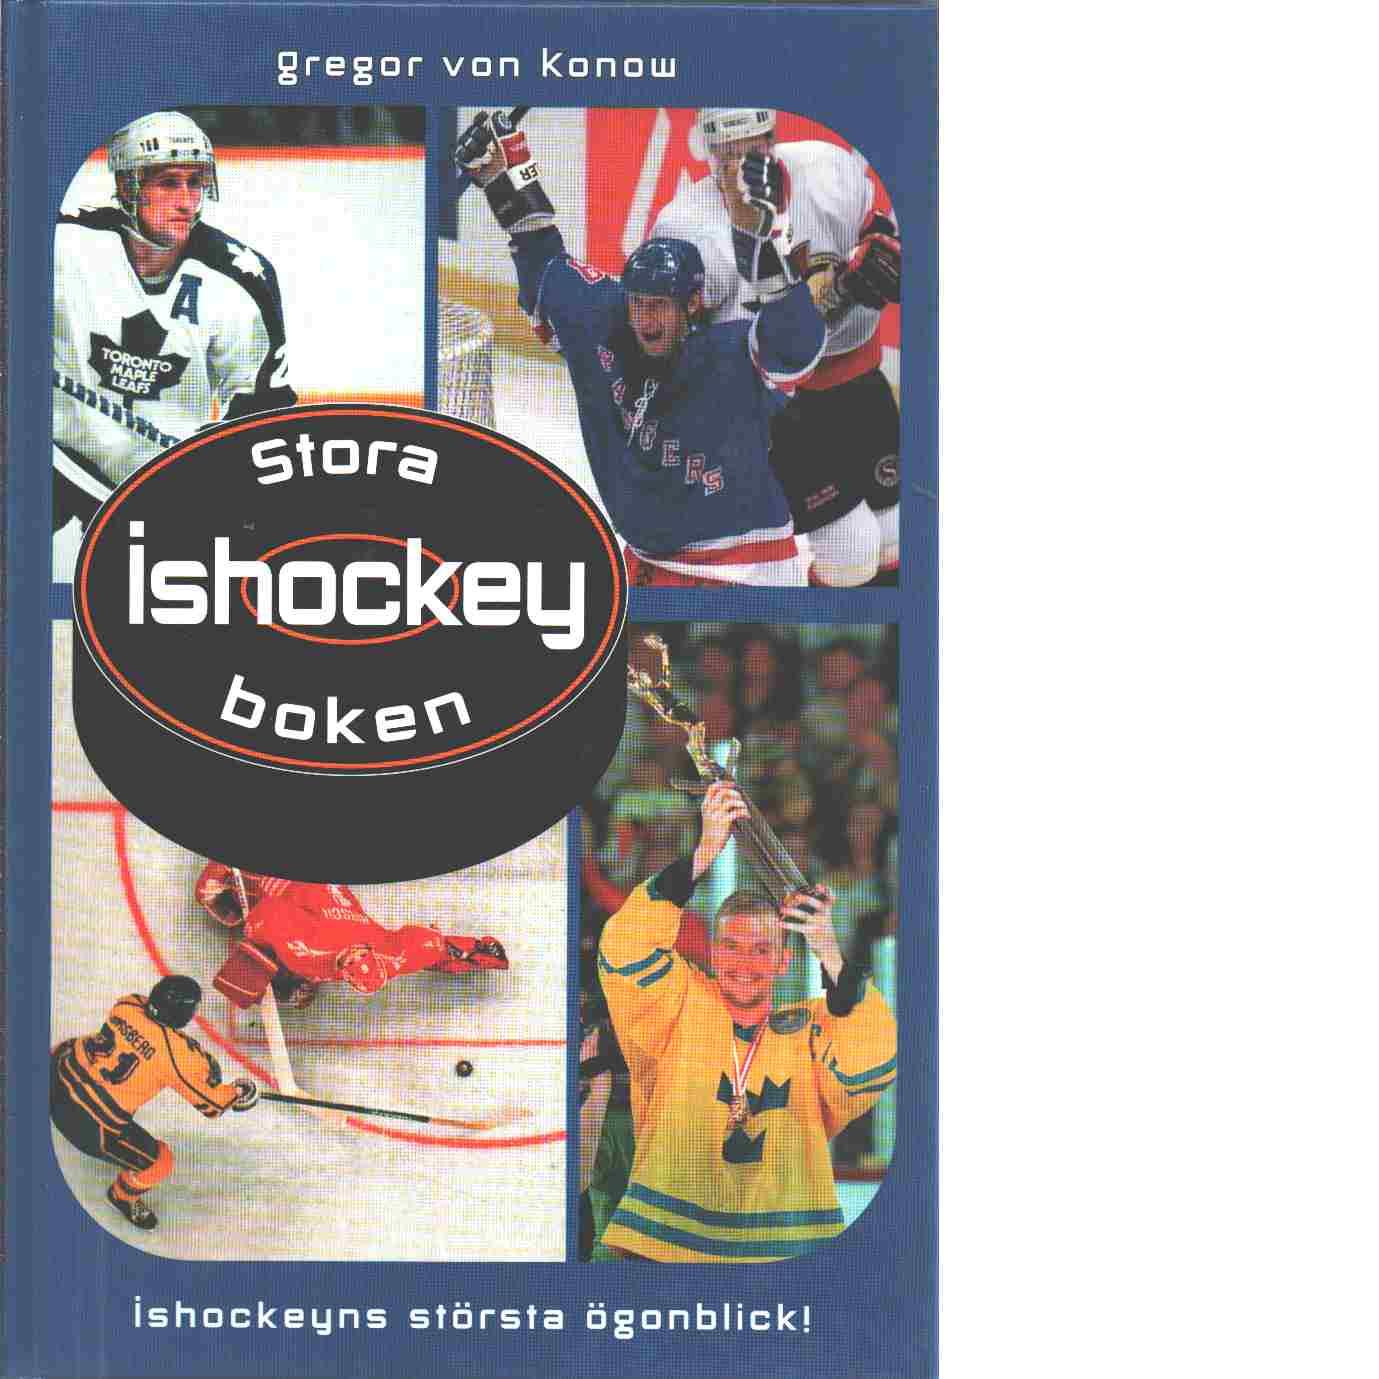 Stora ishockeyboken :ishockeyns största ögonblick - Konow, von Gregor